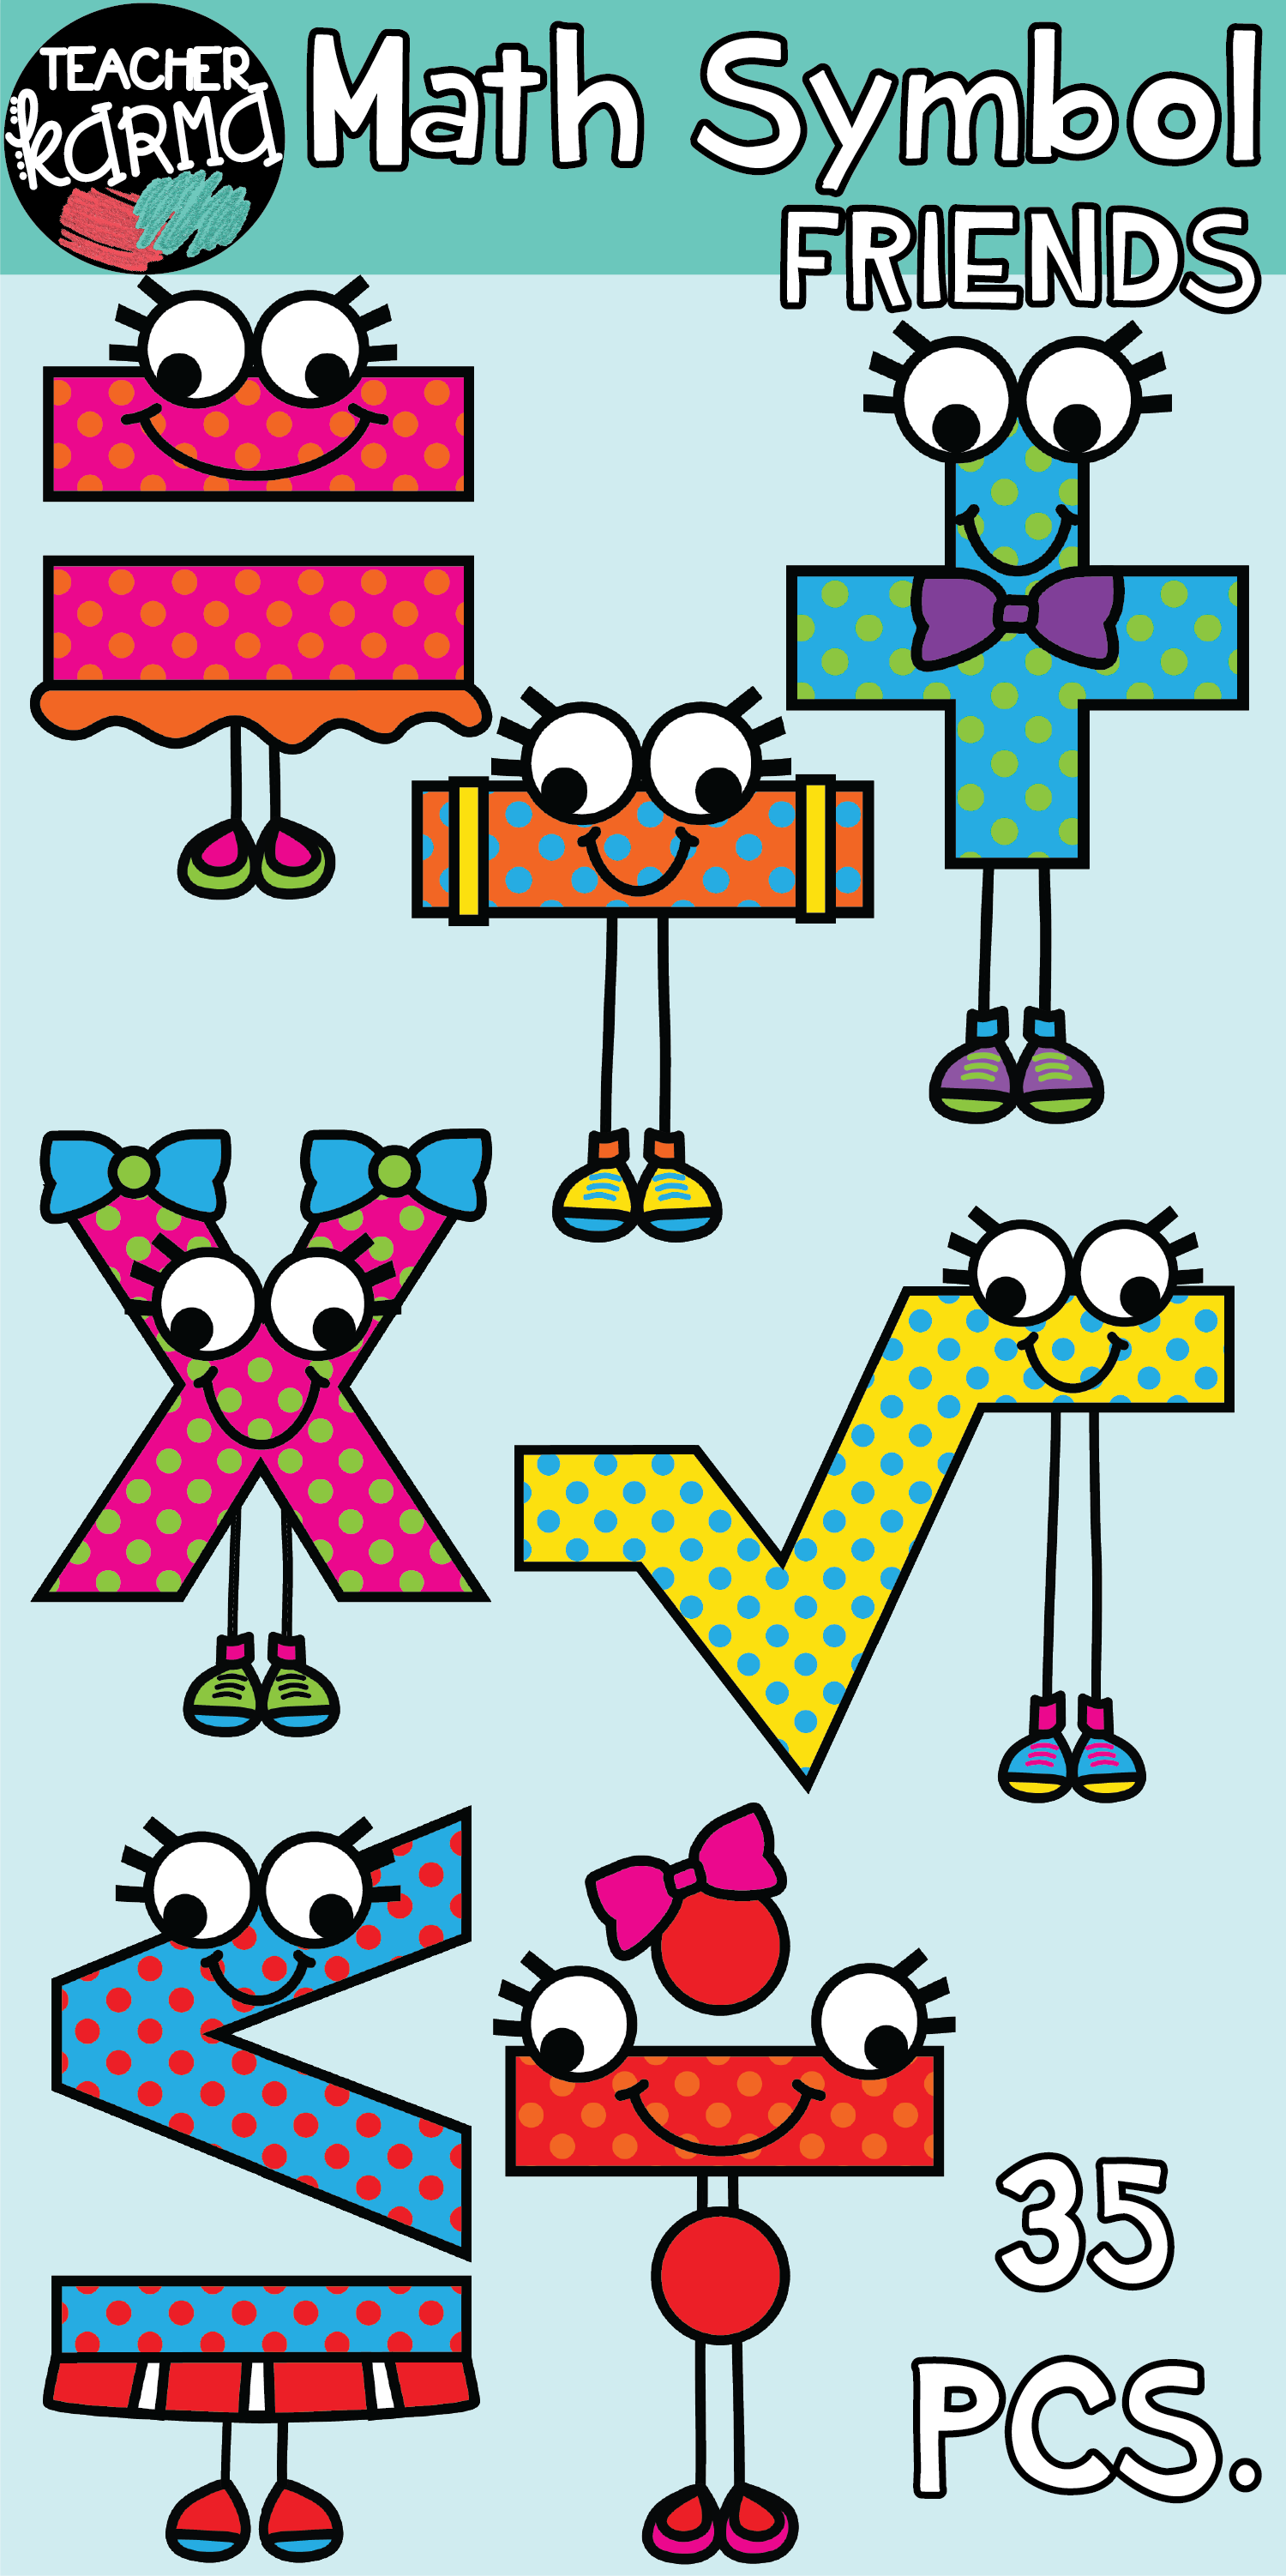 Math Symbol Friends Clipart.